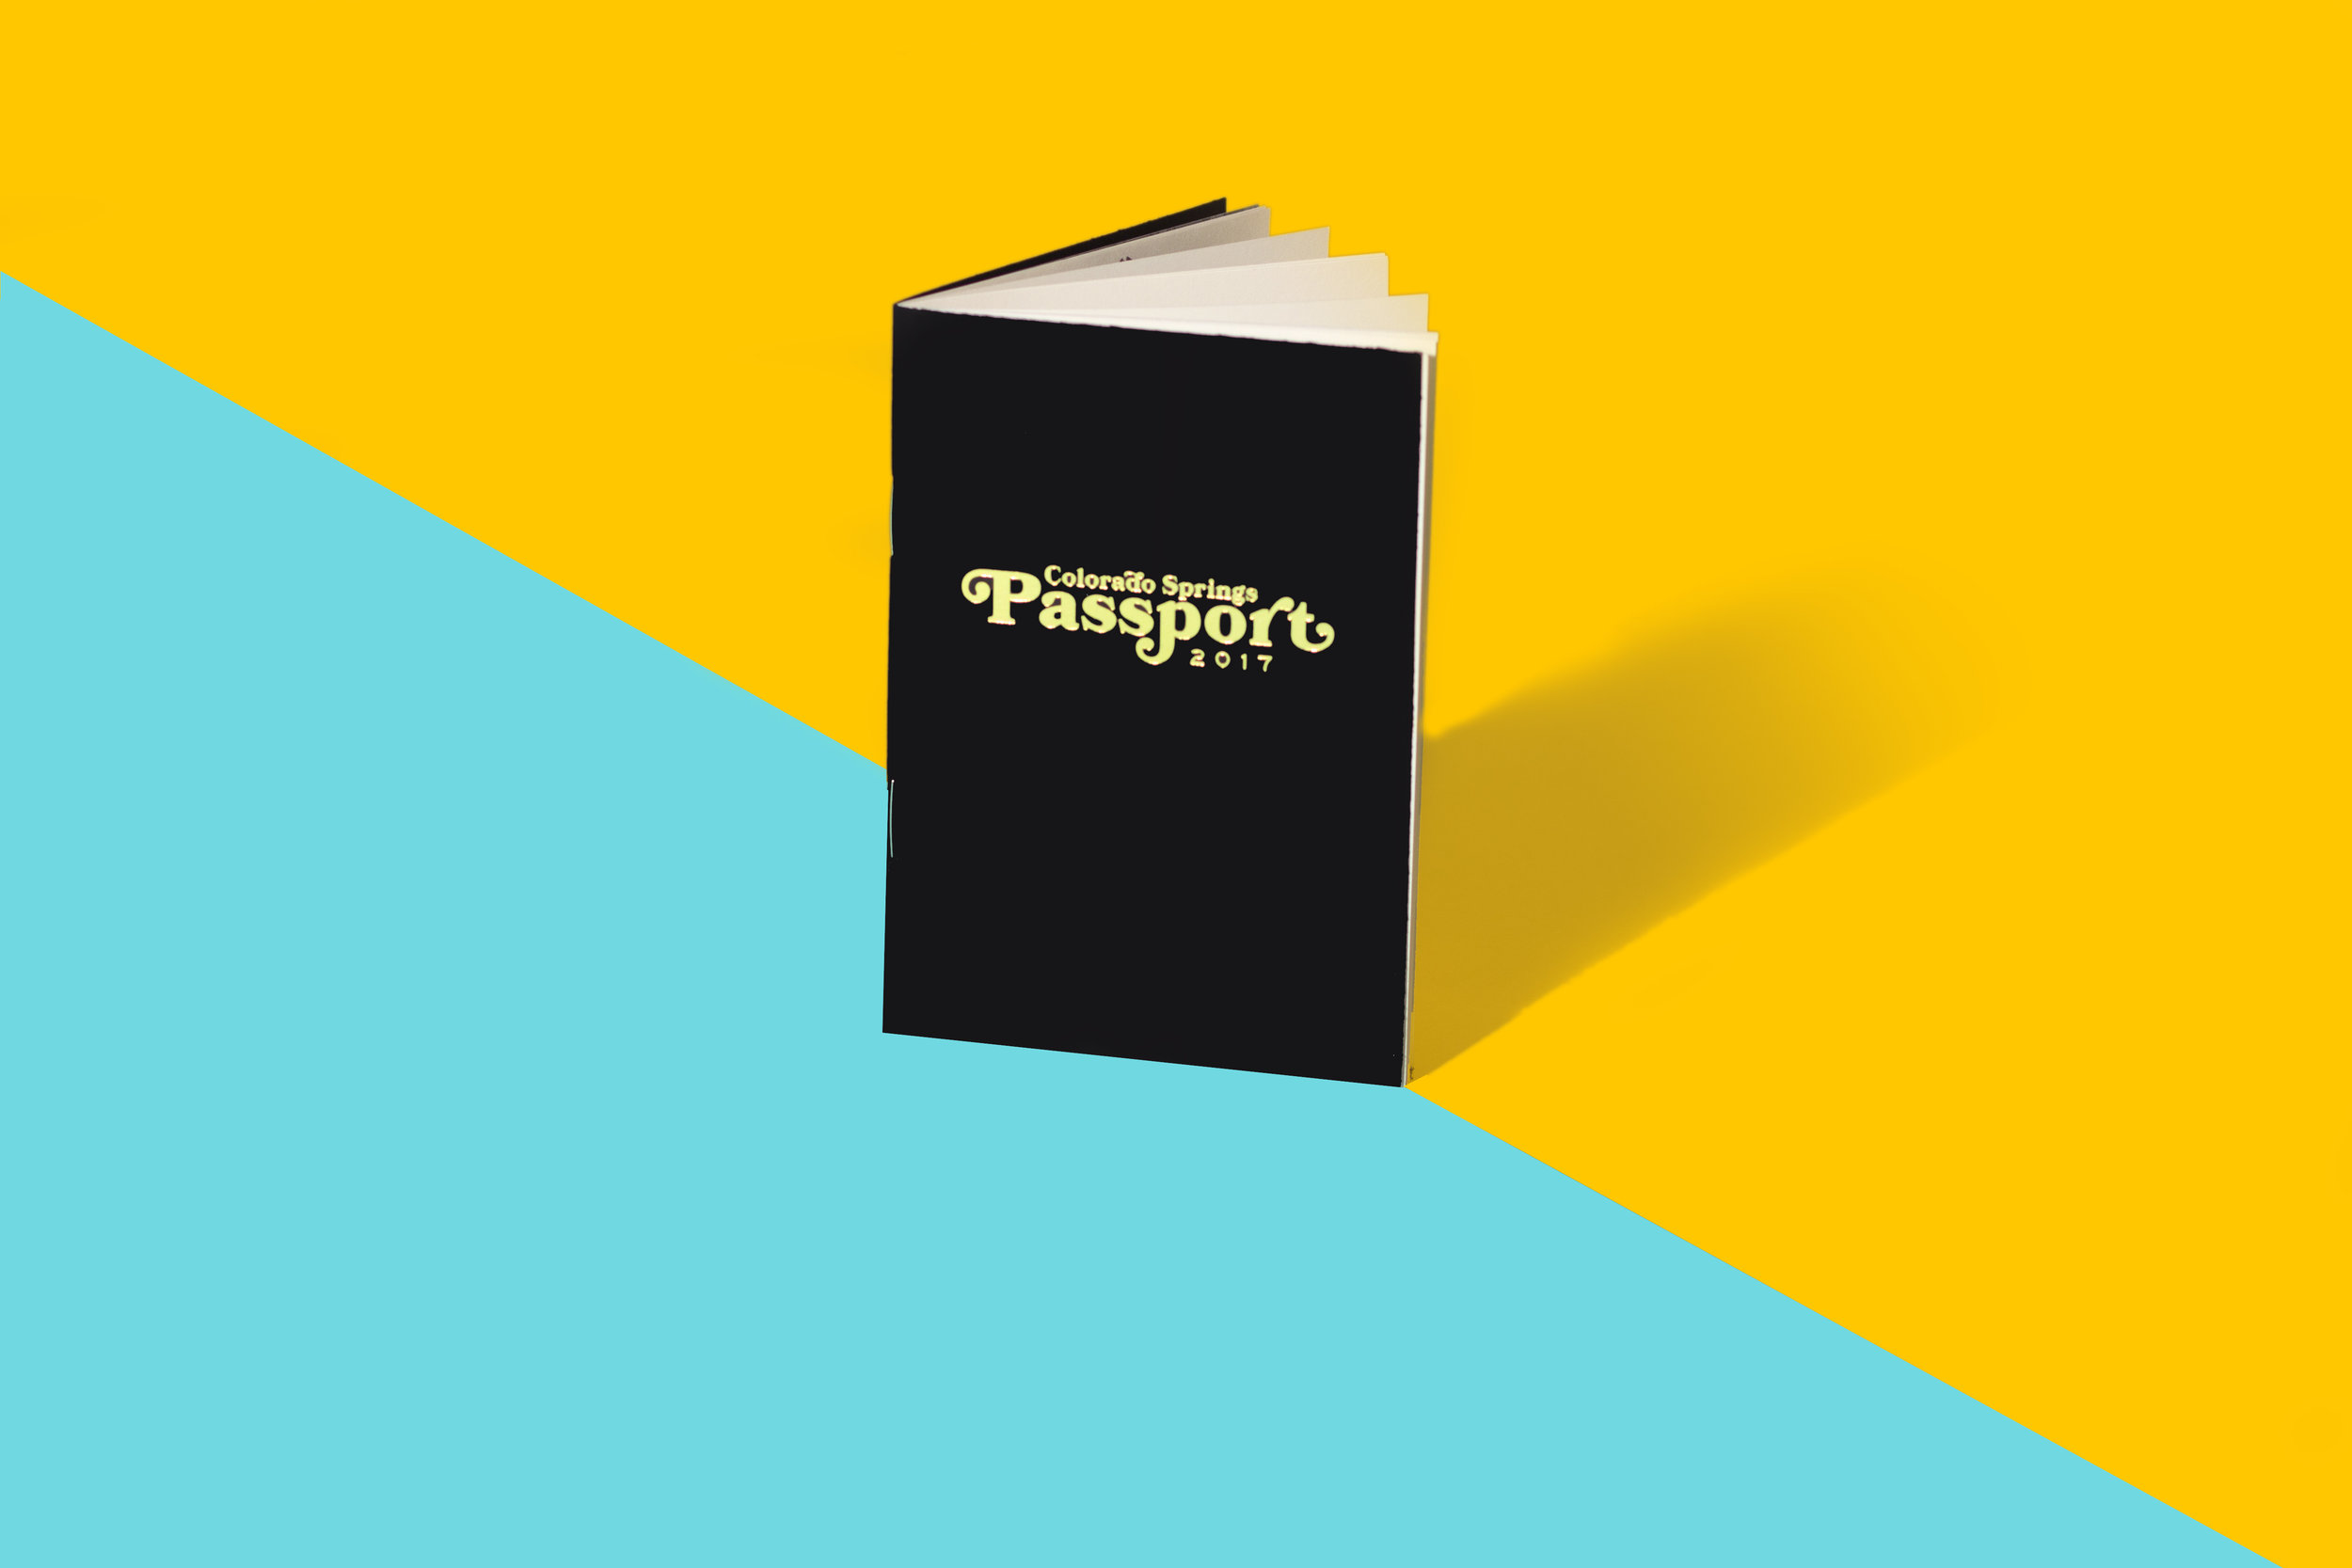 colorado springs summer passport 2017 u2014 the passport program